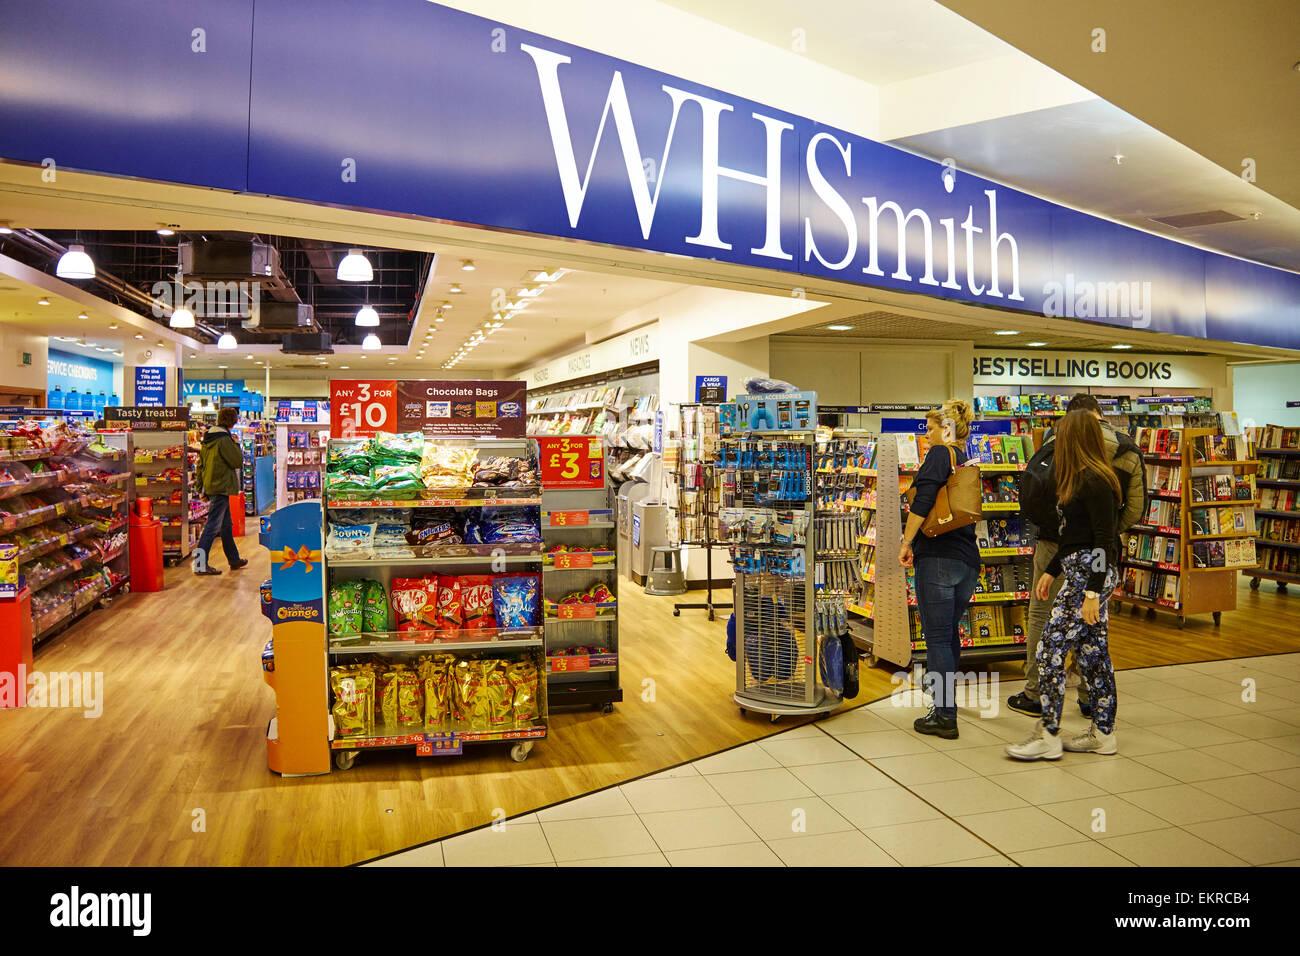 WH Smith Duty Free Store Birmingham Airport UK - Stock Image